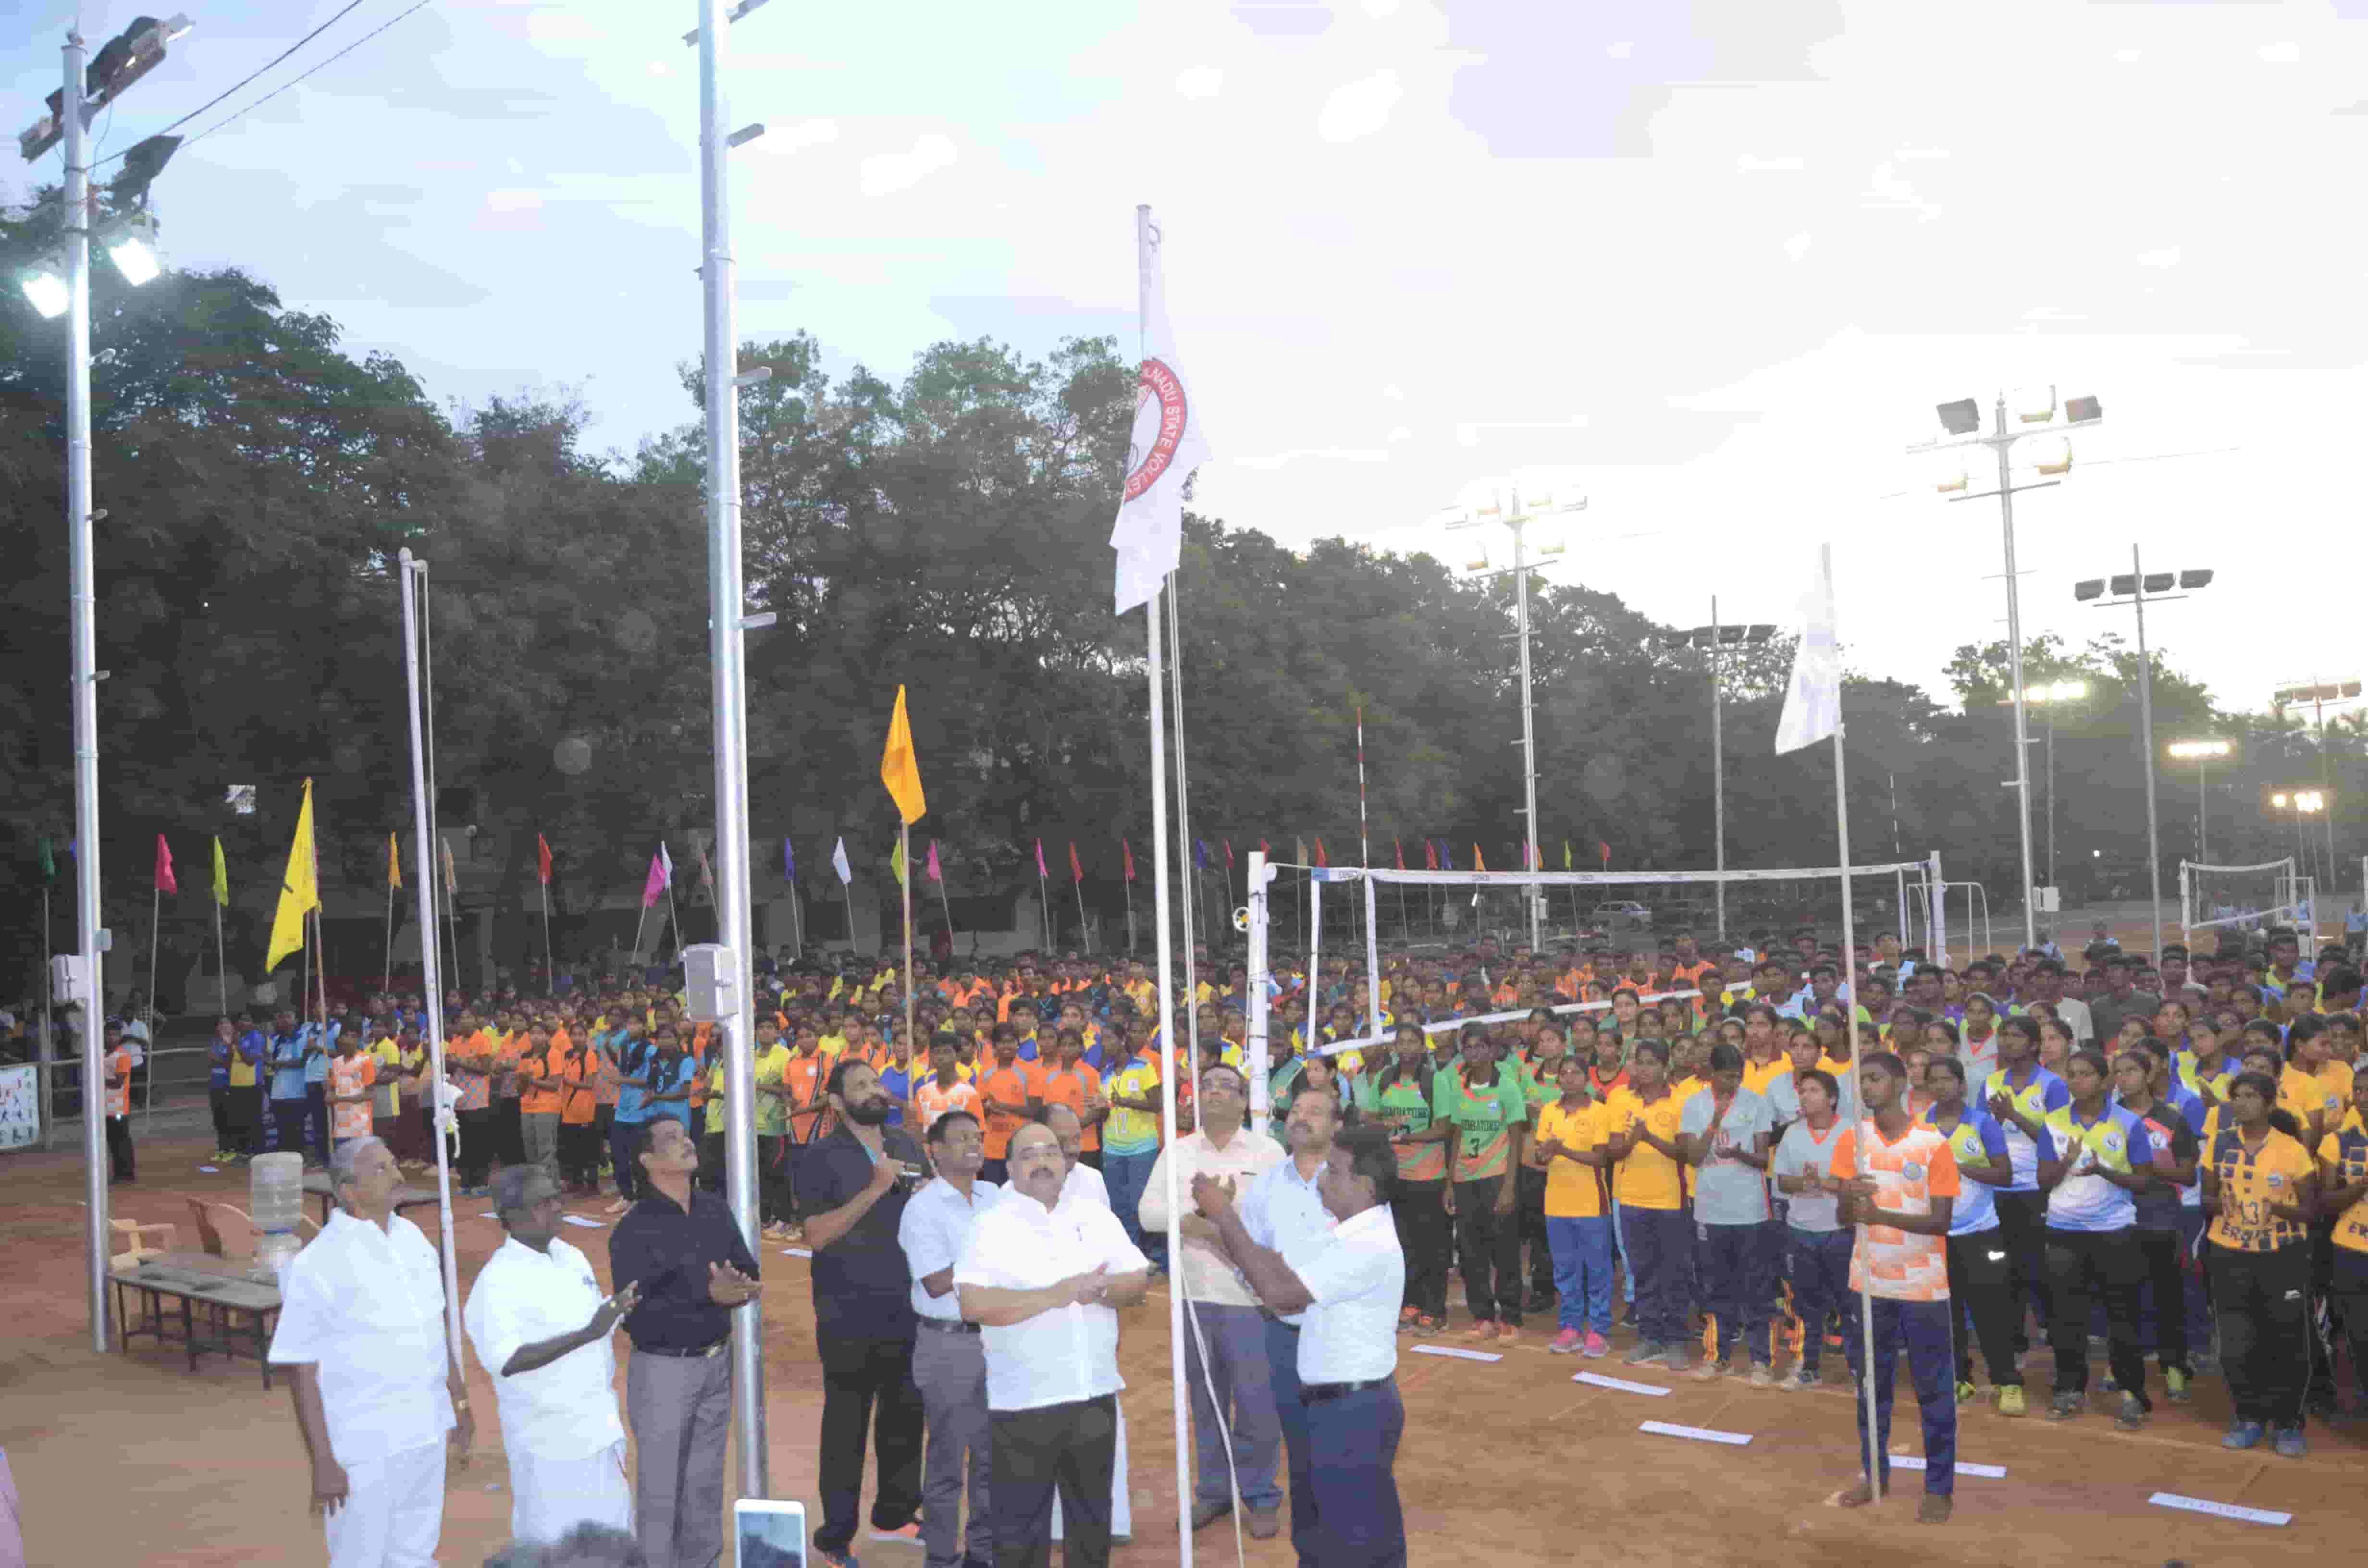 https://tnsva-live.s3.ap-south-1.amazonaws.com/1580735183/State_Junior_Championship_2020_Tiruvarur1.JPG